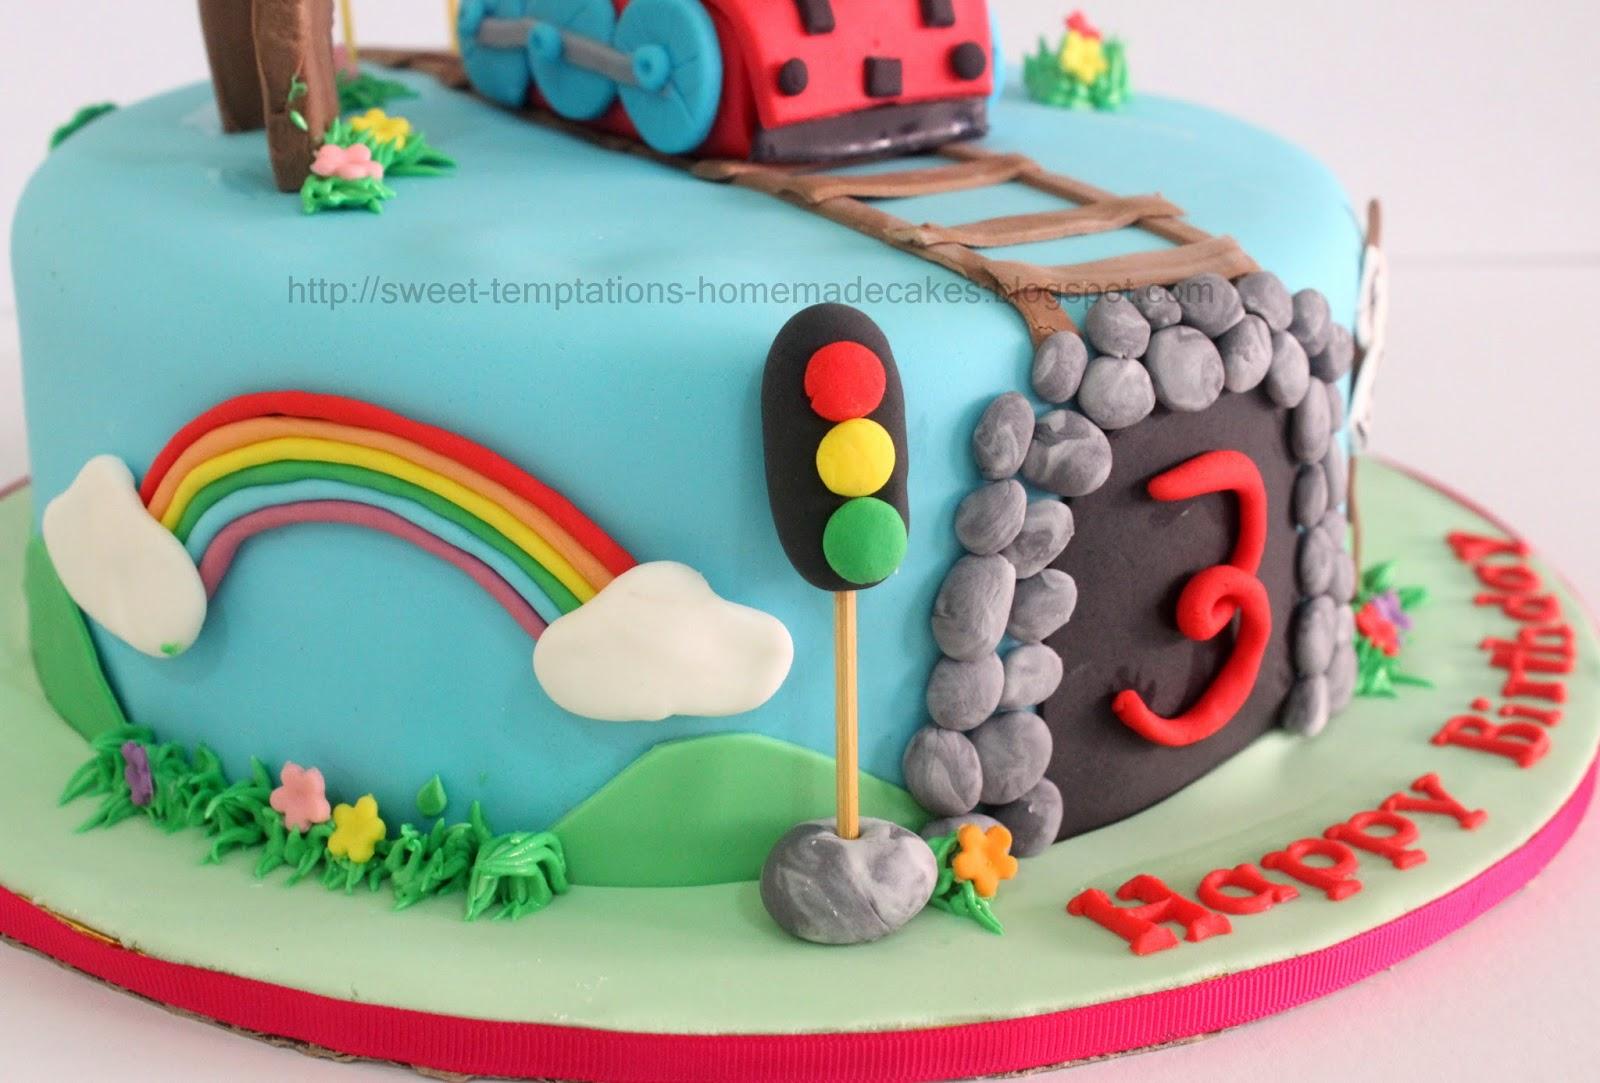 Sweet Temptations Homemade Cakes Amp Pastry Thomas Train Cake